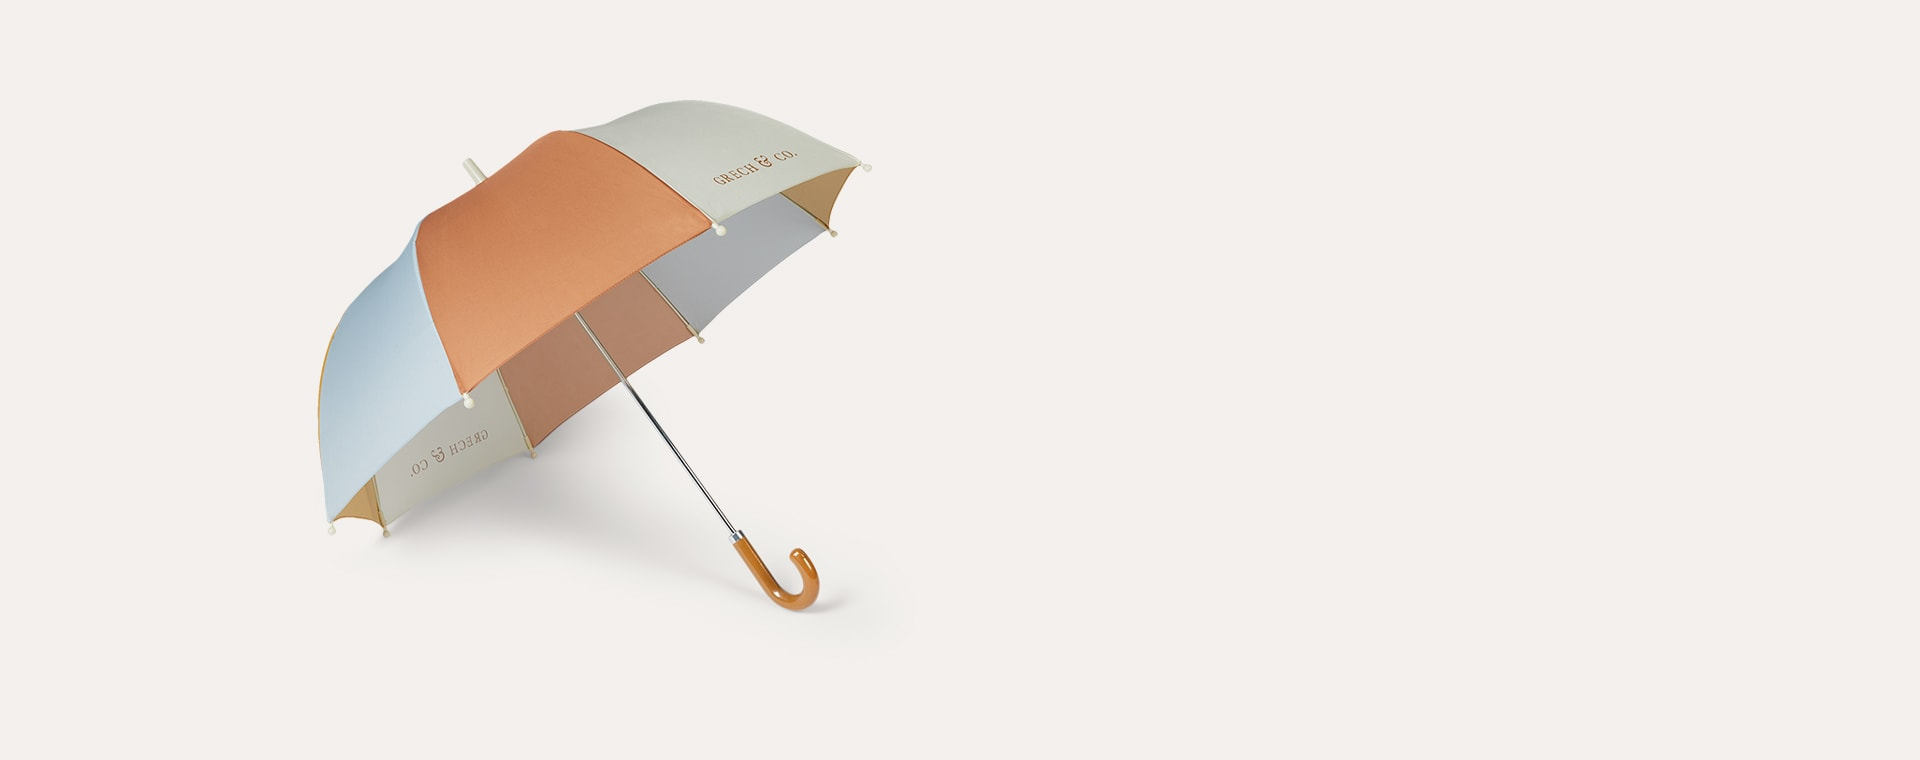 Light Blue Grech & Co Sustainable Umbrella